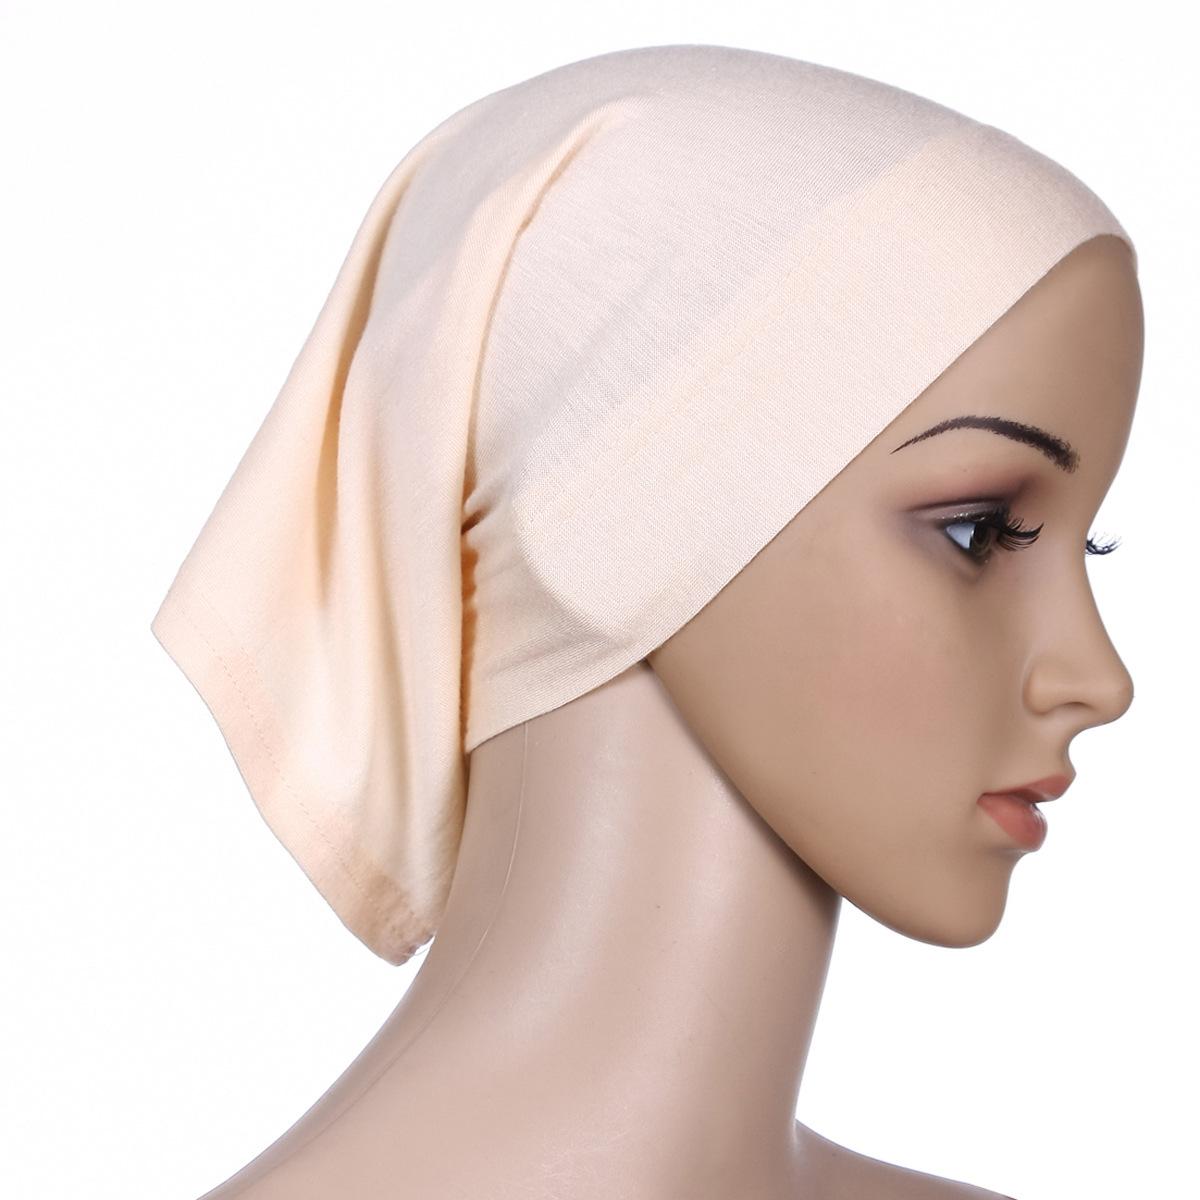 Hot sale inner women hijab cap cotton turban muslim under scarf hijab muslim modal cap